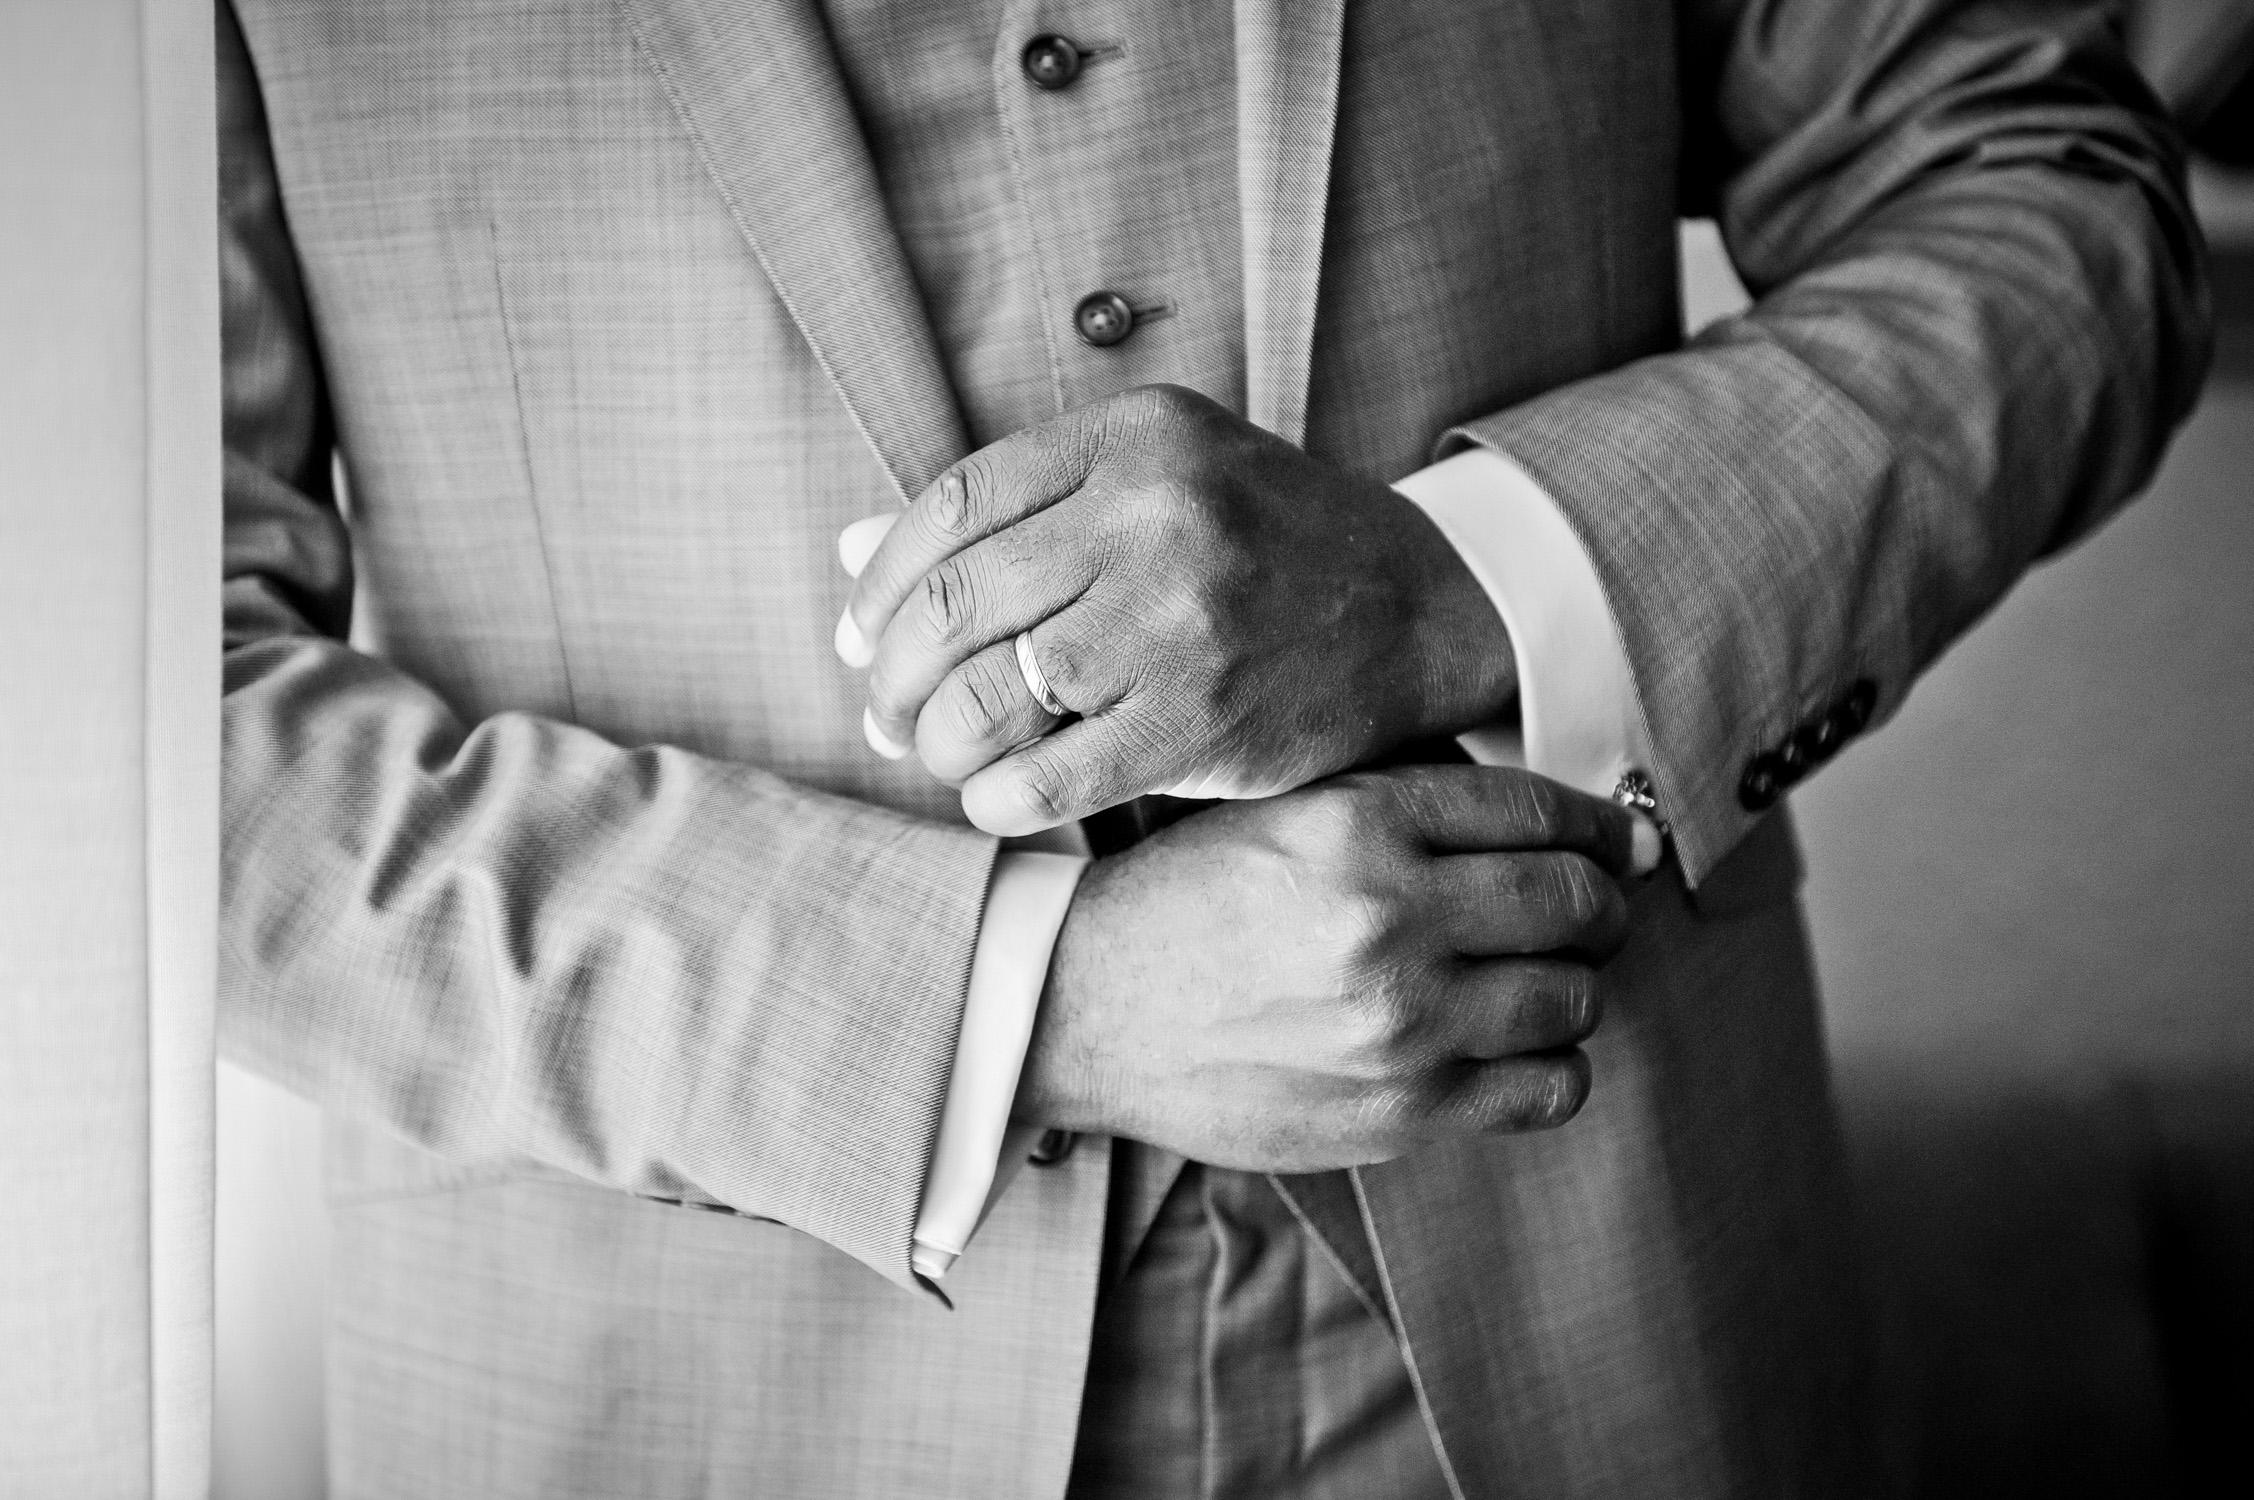 cameraman mariage lyon,mariée du rhone lyon,Photographe Book Mariage